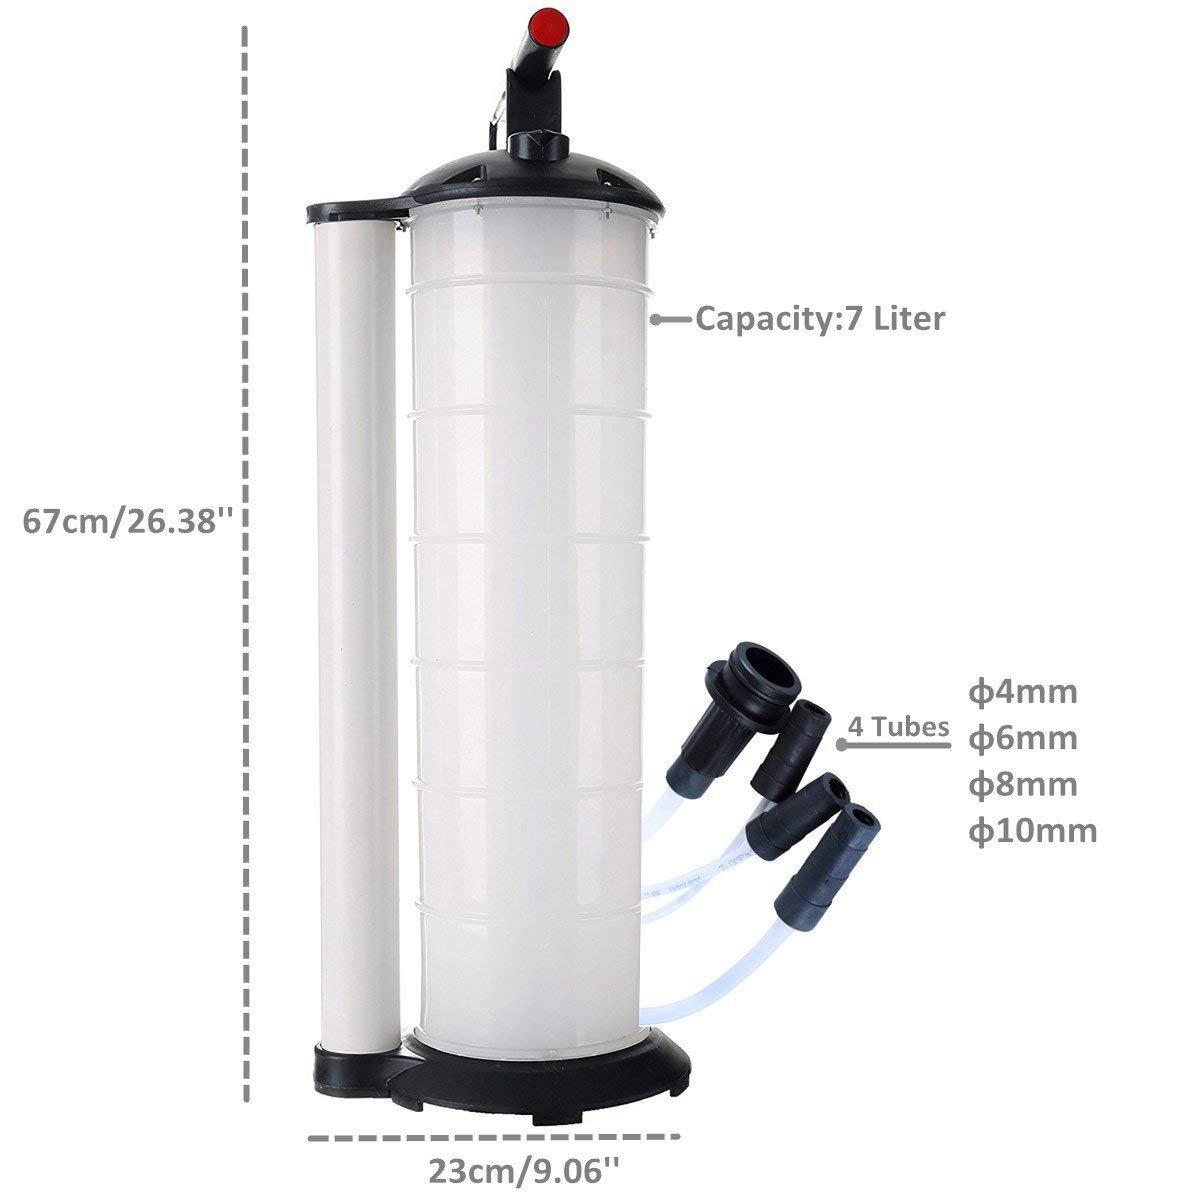 DASBET 7L Fluid Extractor Handbuch Ö l Changer Vakuum Hand Operated Motor, Change Fluid Extractor der Hand Pumpe Tank Entferner ZTECH AUTO